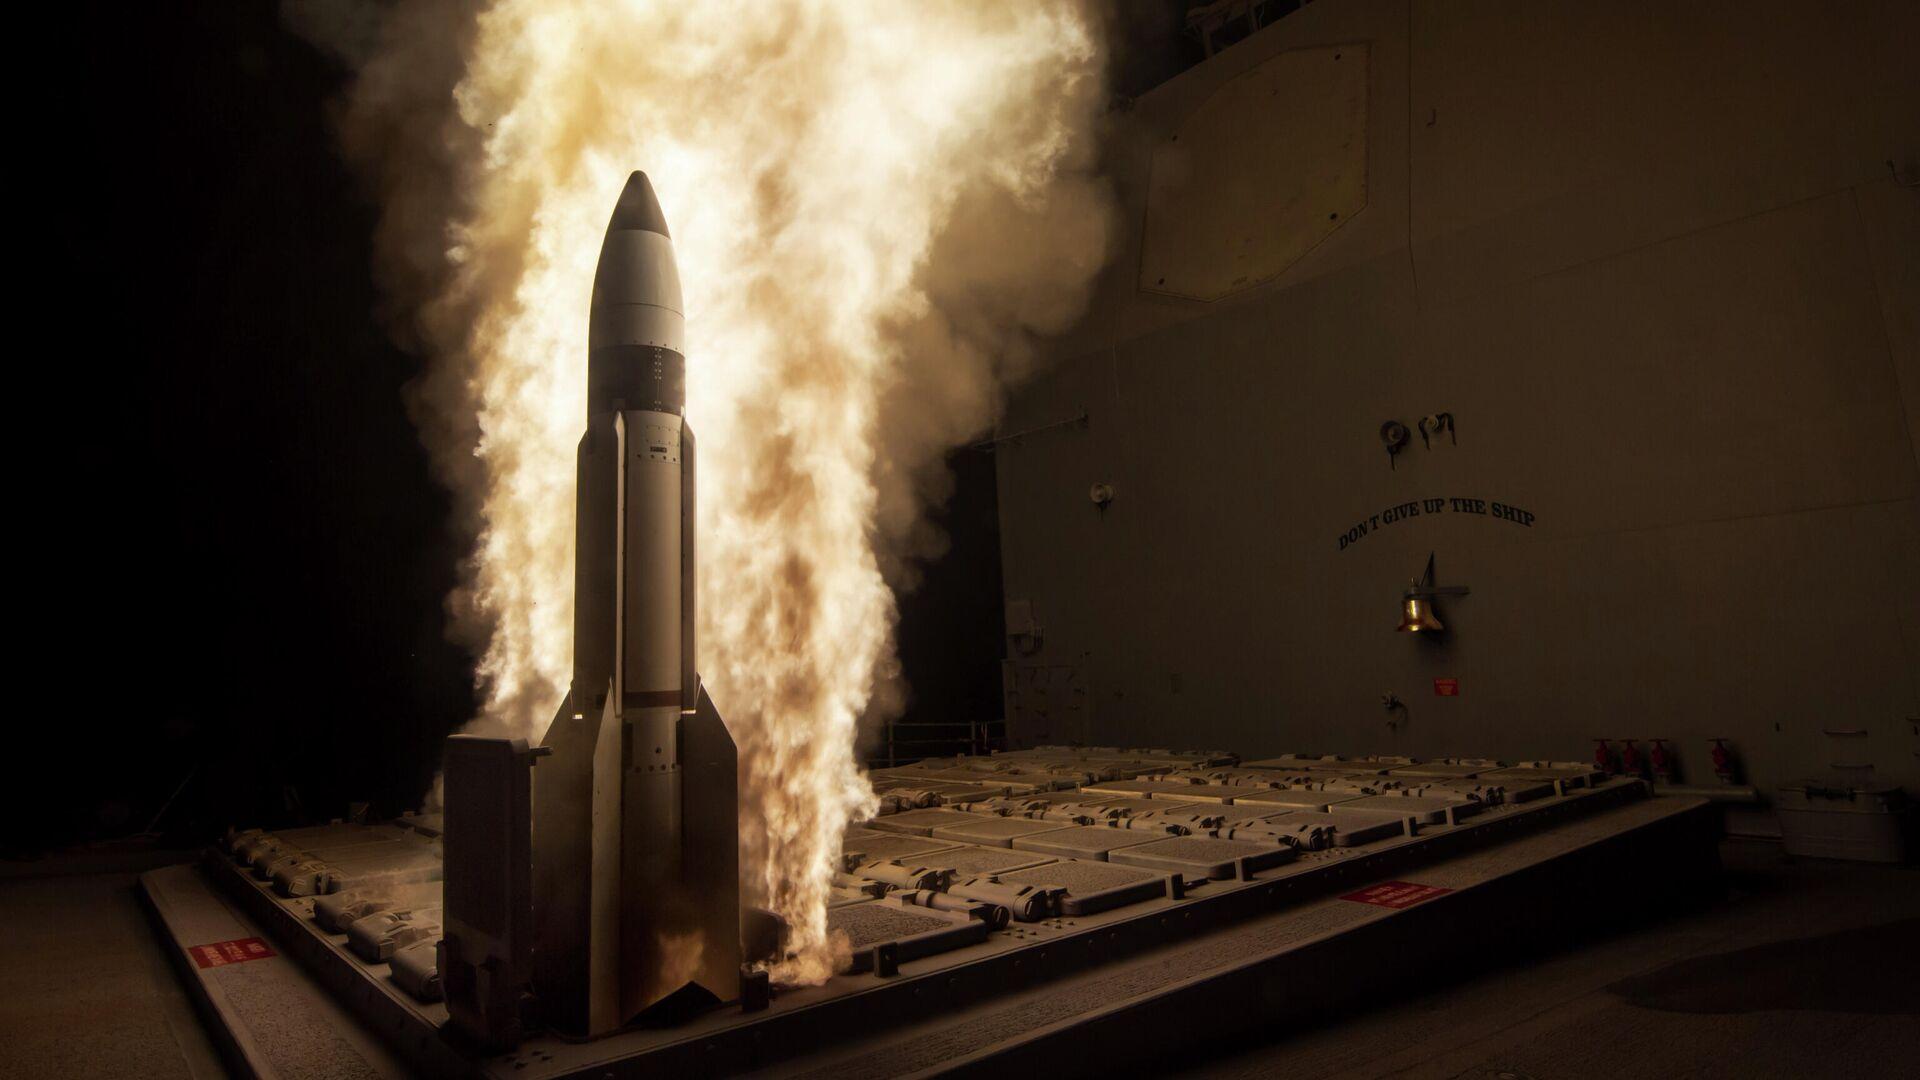 Un misil guiado Standard Missile-3 se lanza desde el USS Lake Erie durante una prueba - Sputnik Mundo, 1920, 03.04.2021